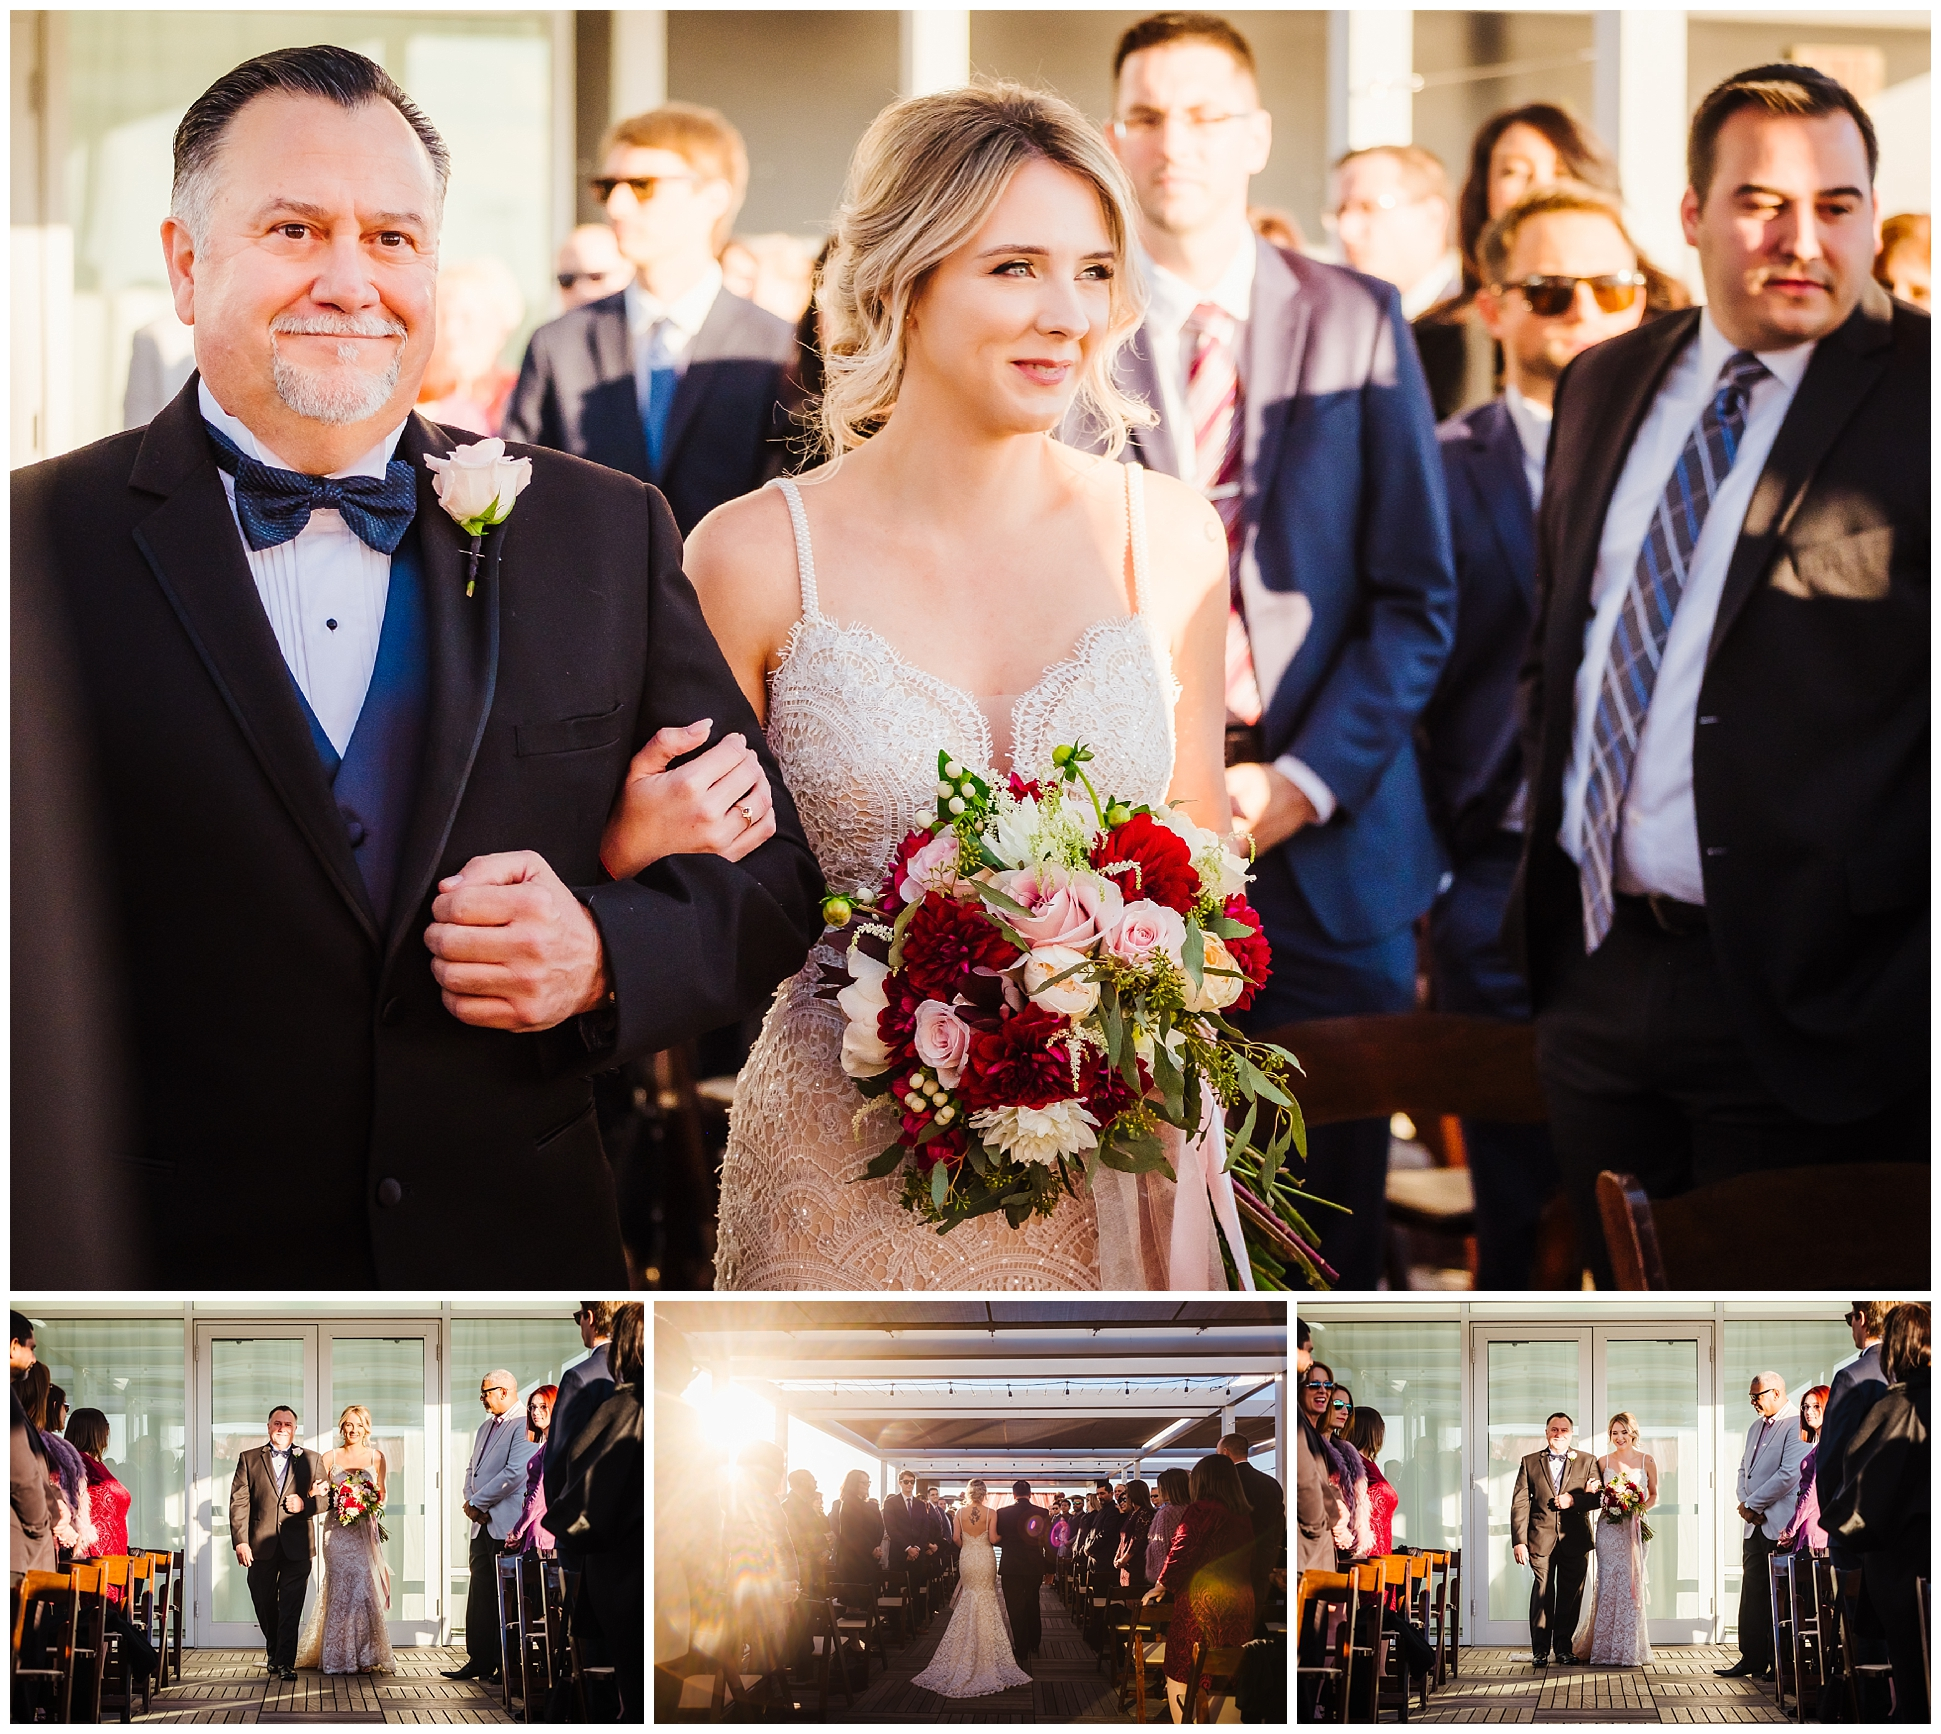 tampa-armeture-wedding-photographer-edgy-industrial-downtown-fancy-free-nursery-tattoo-burgandy-velvet_0046.jpg